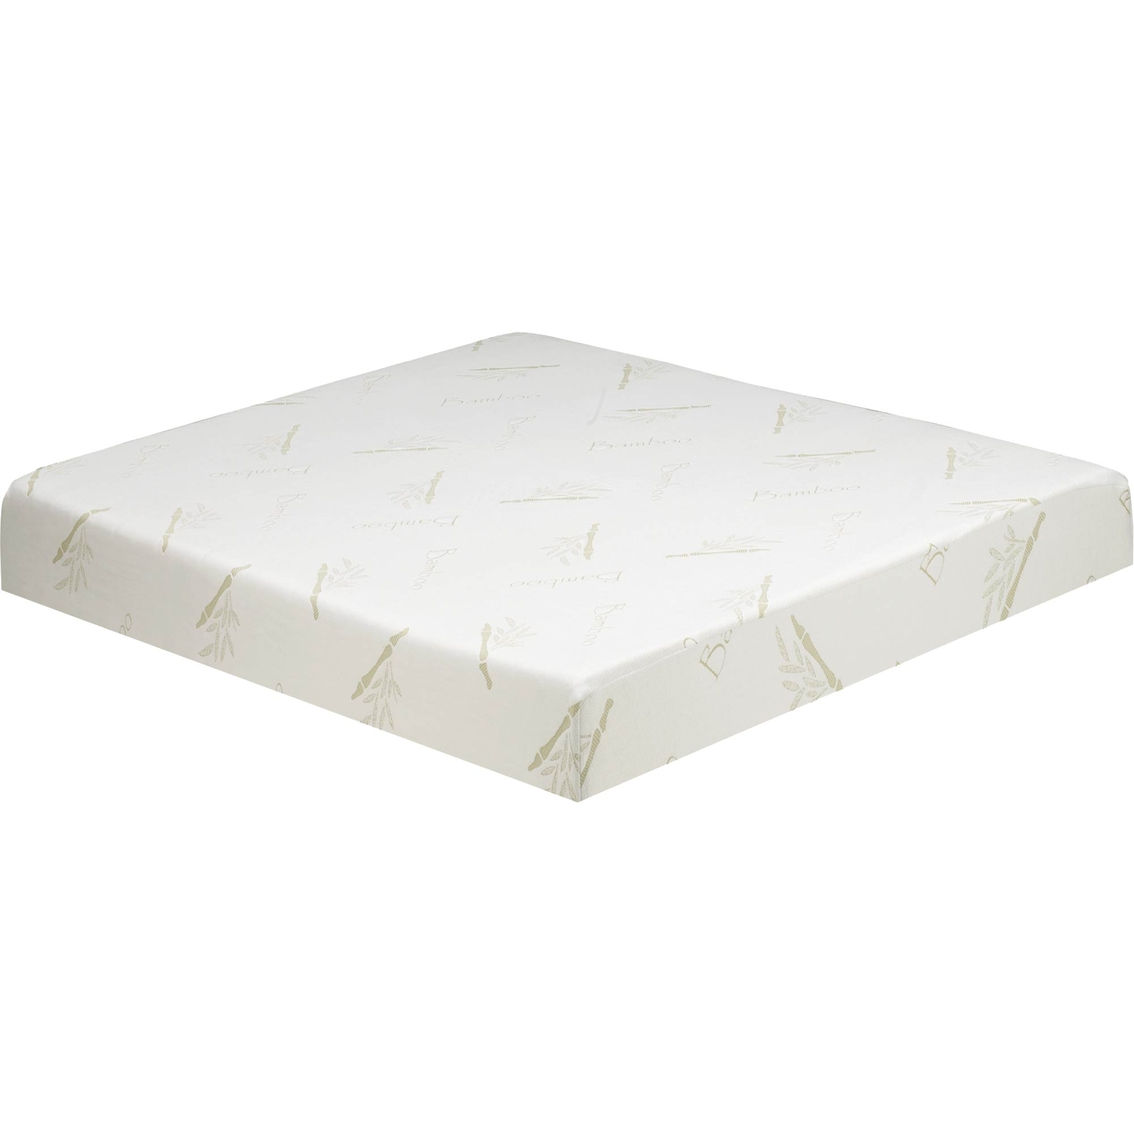 engineered latex foam mattress